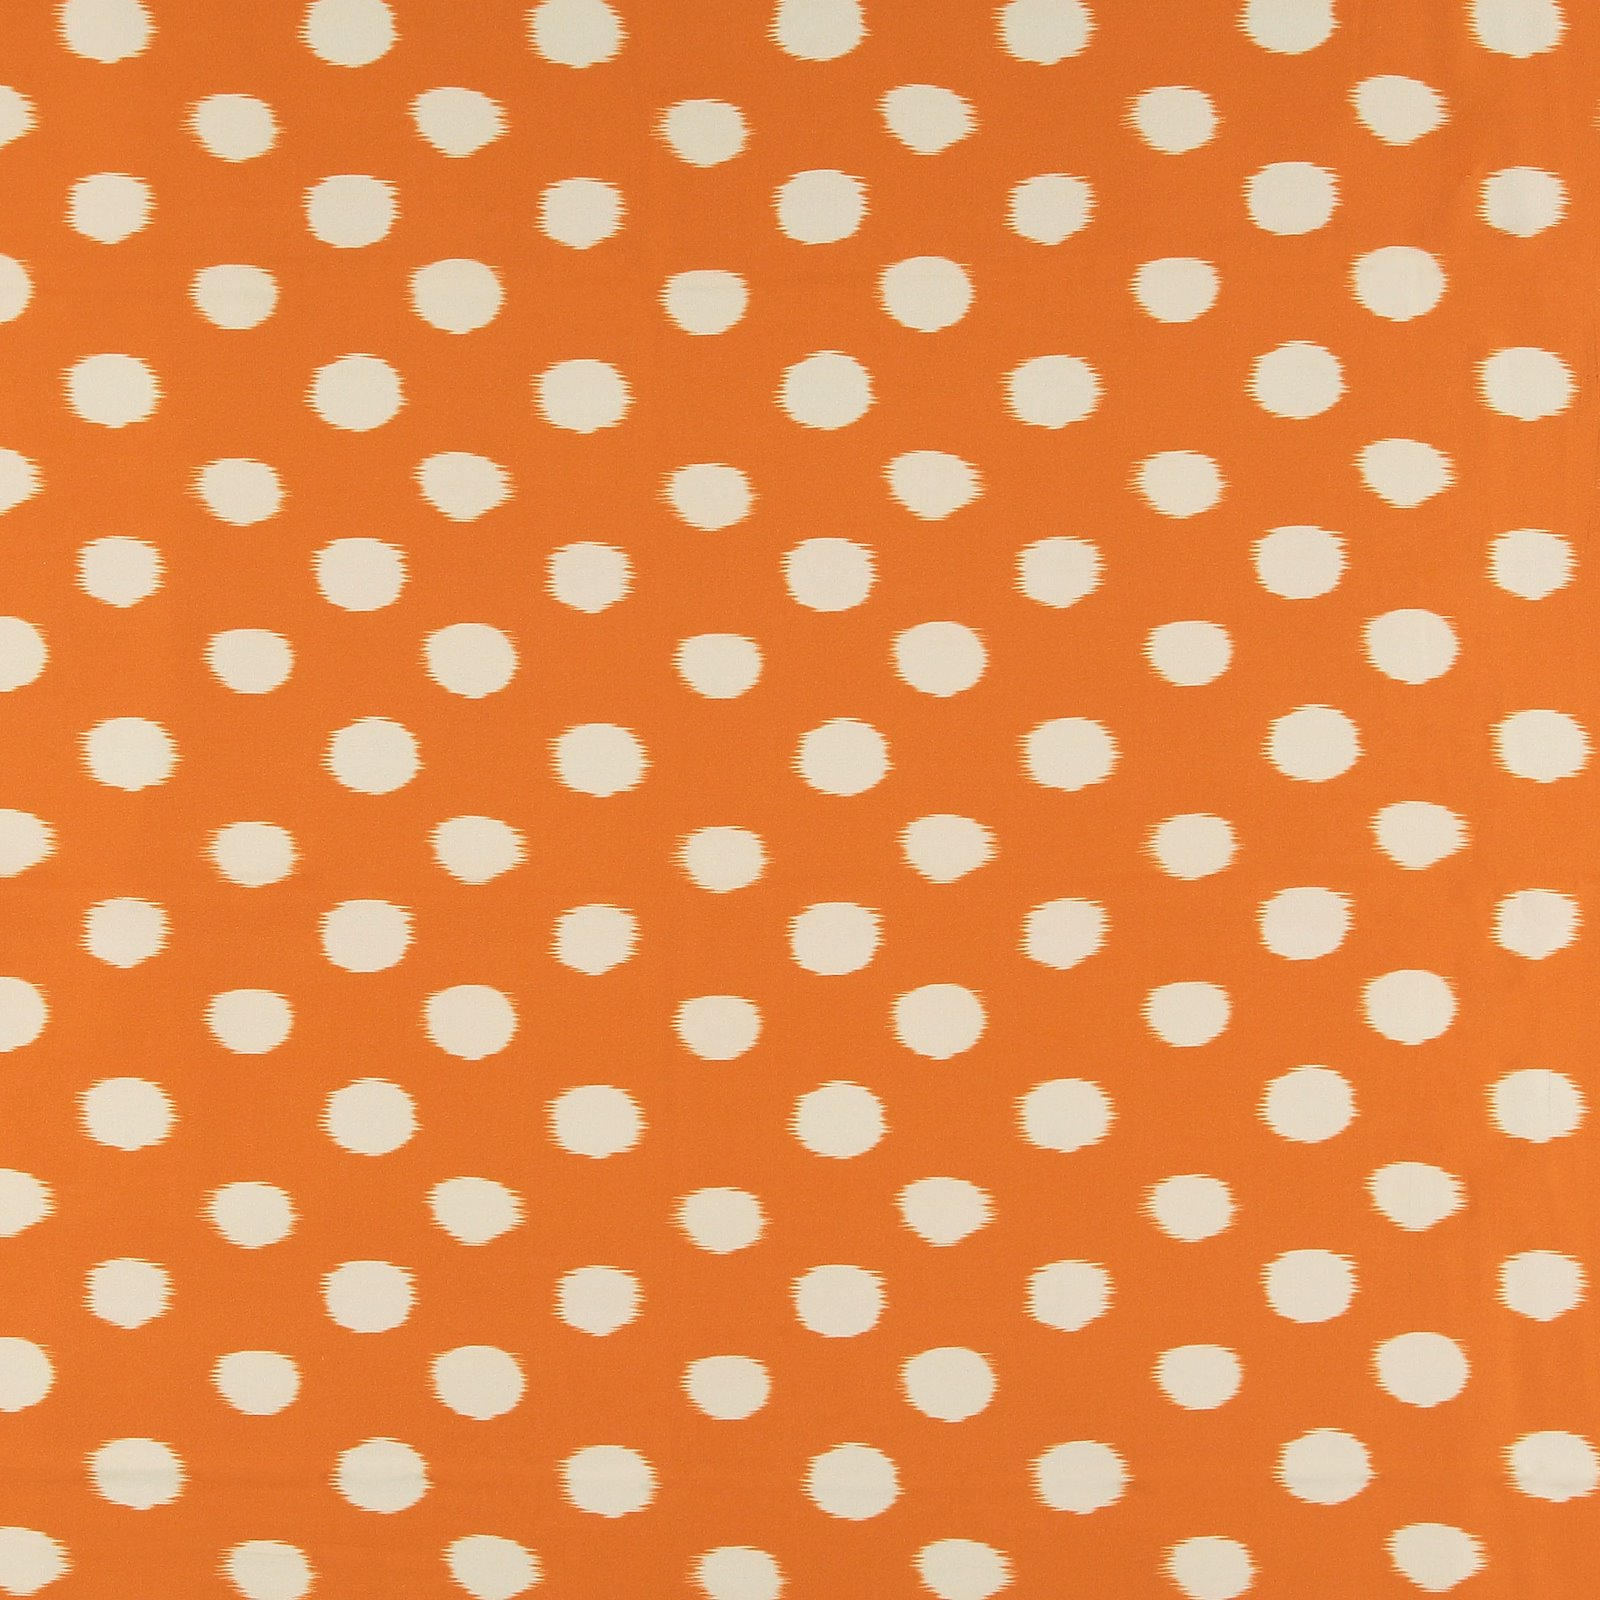 Ecovero Viskose gewebt, Orange, Punkte 710690_pack_sp